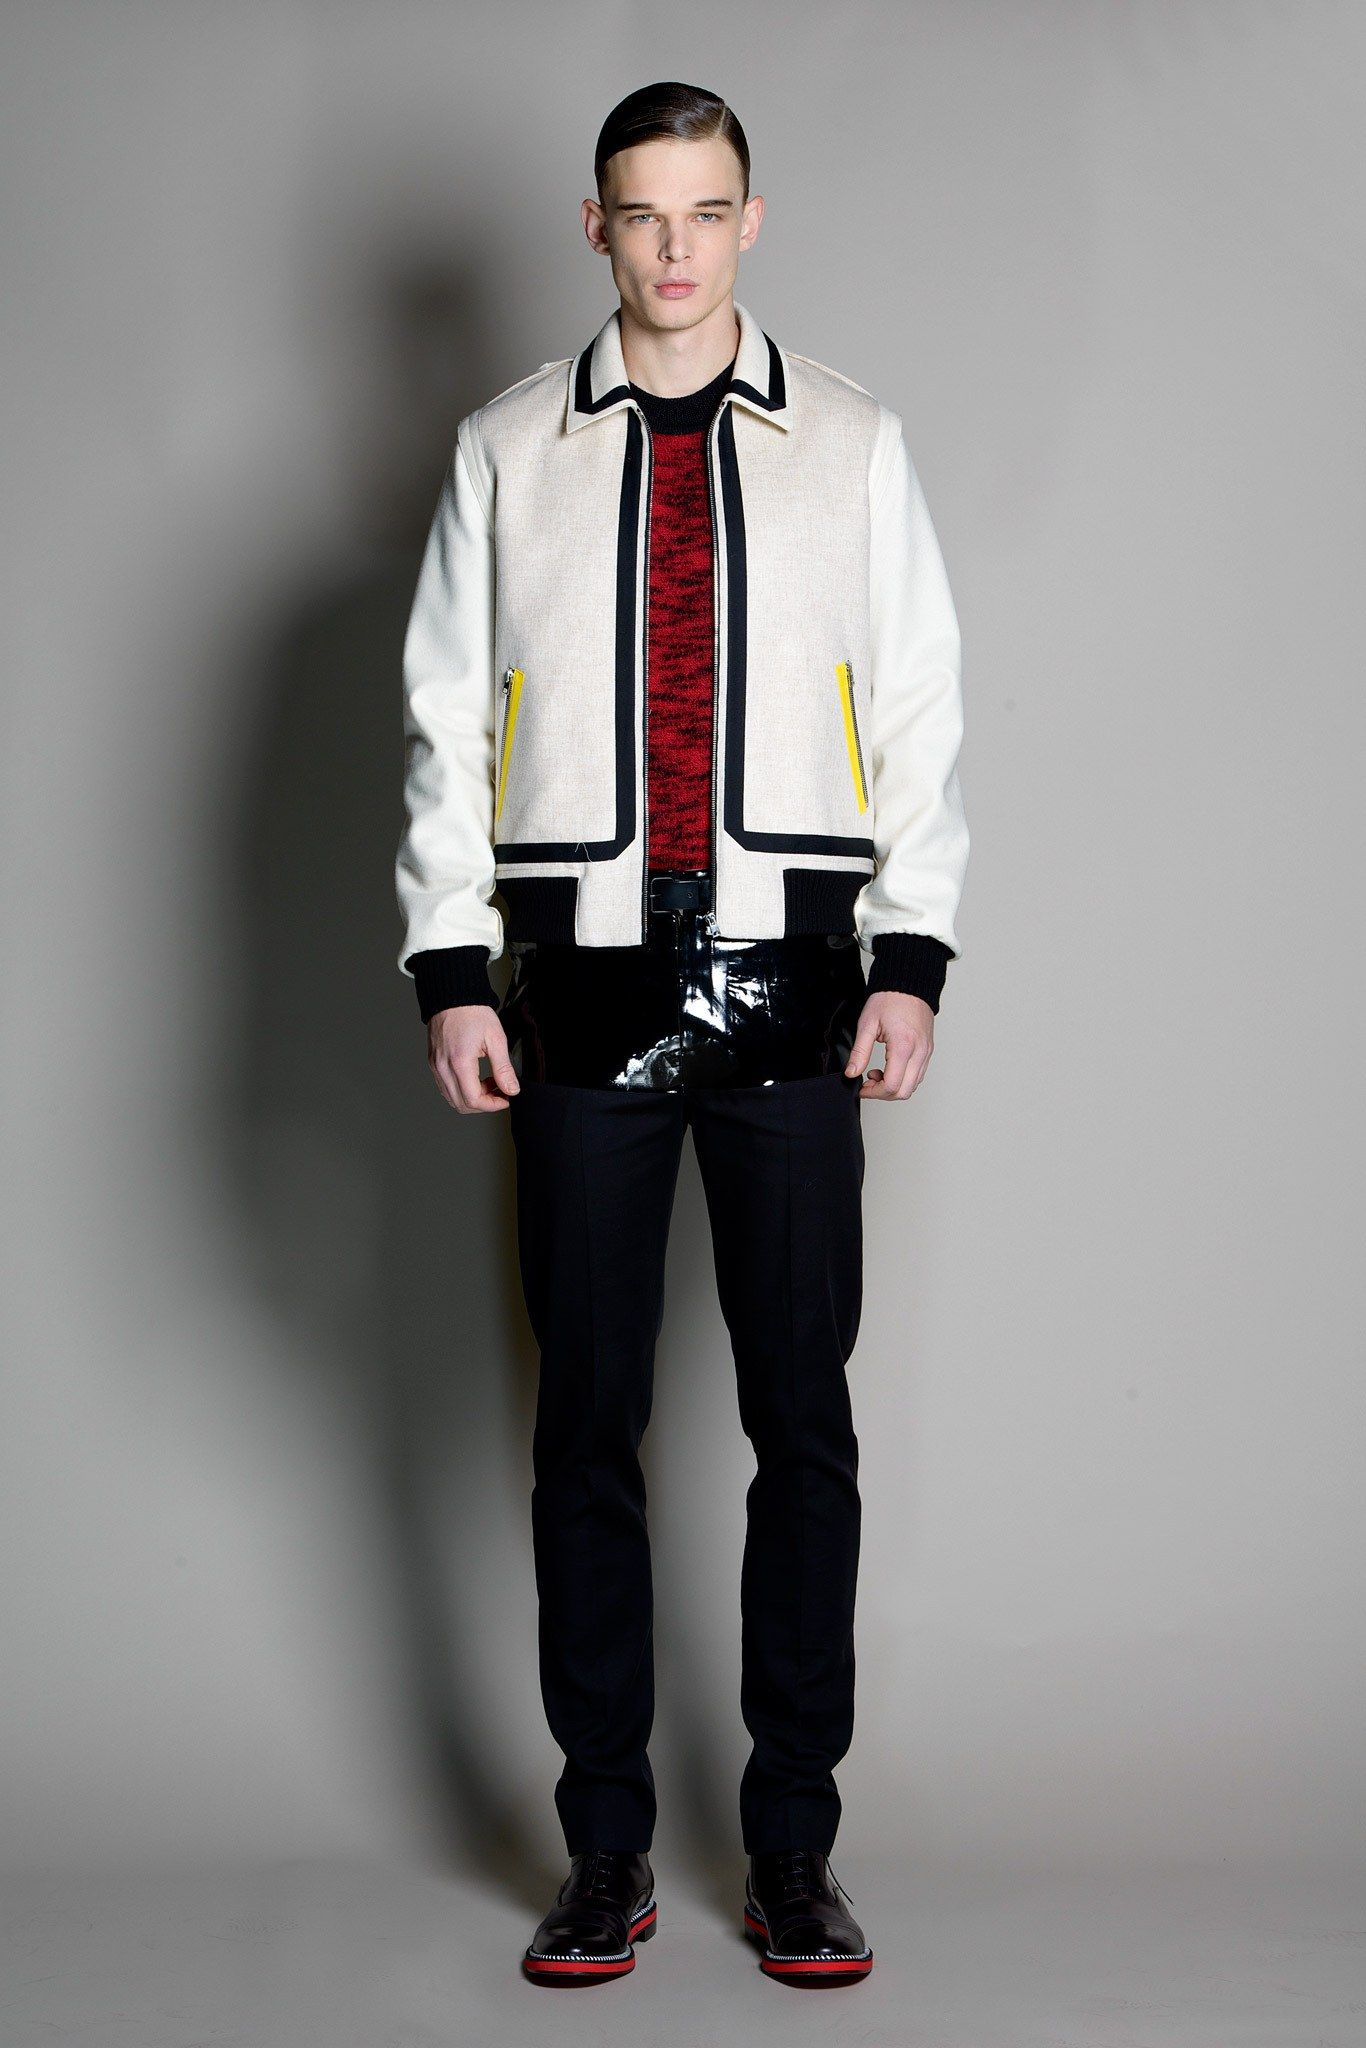 , Jonathan Saunders Fall 2014 Menswear Fashion Show, My Pop Star Kda Blog, My Pop Star Kda Blog